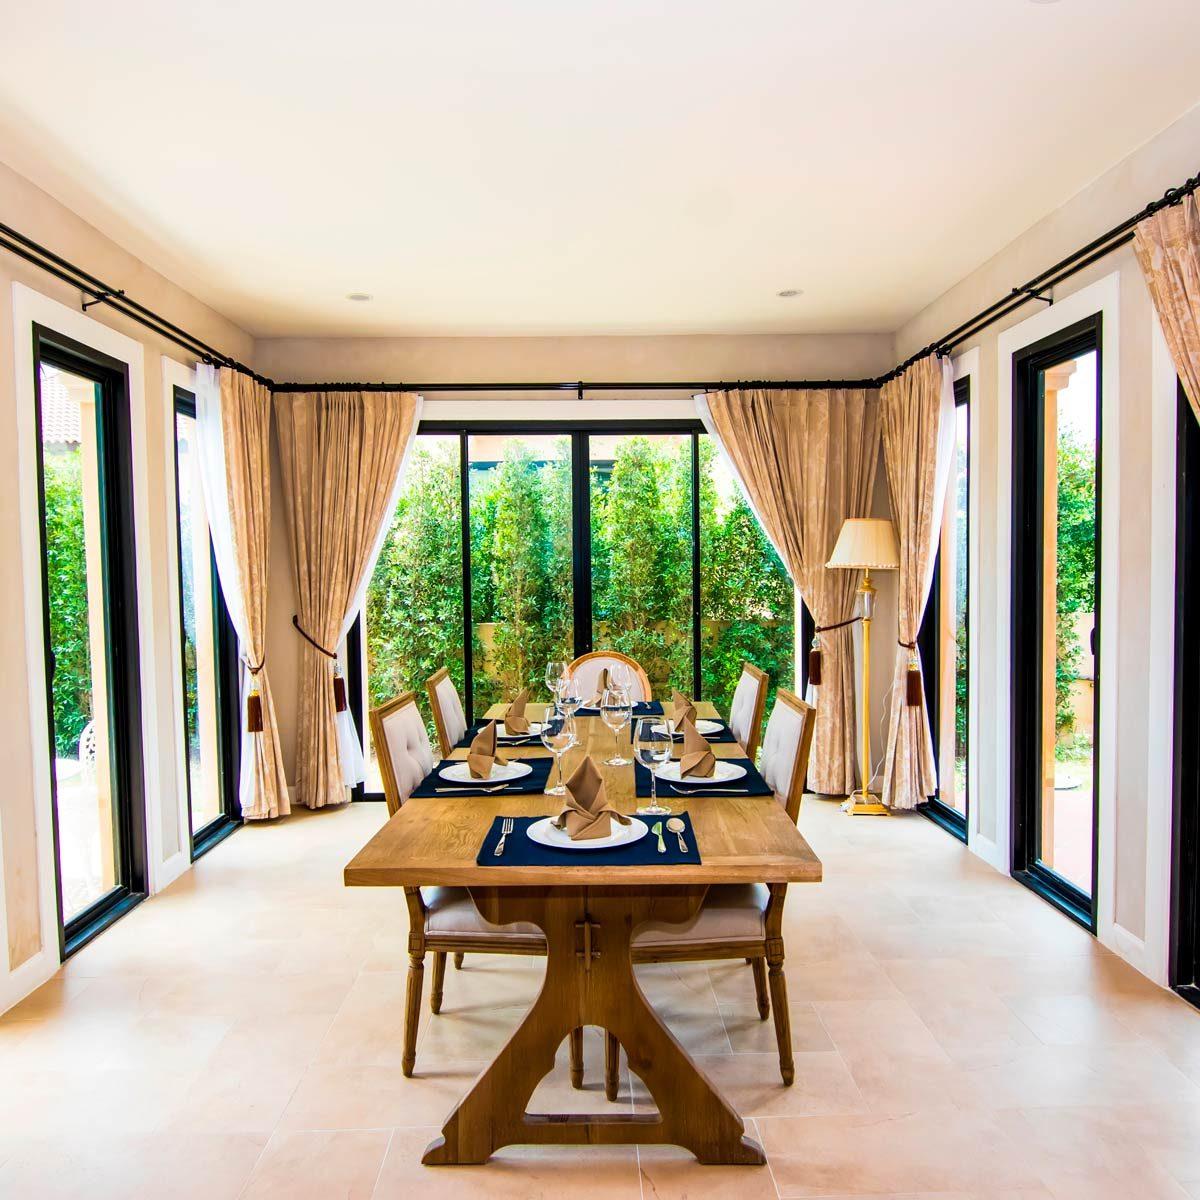 Stylish Dining Room Curtain Ideas | Family Handyman on Dining Room Curtain Ideas  id=34213